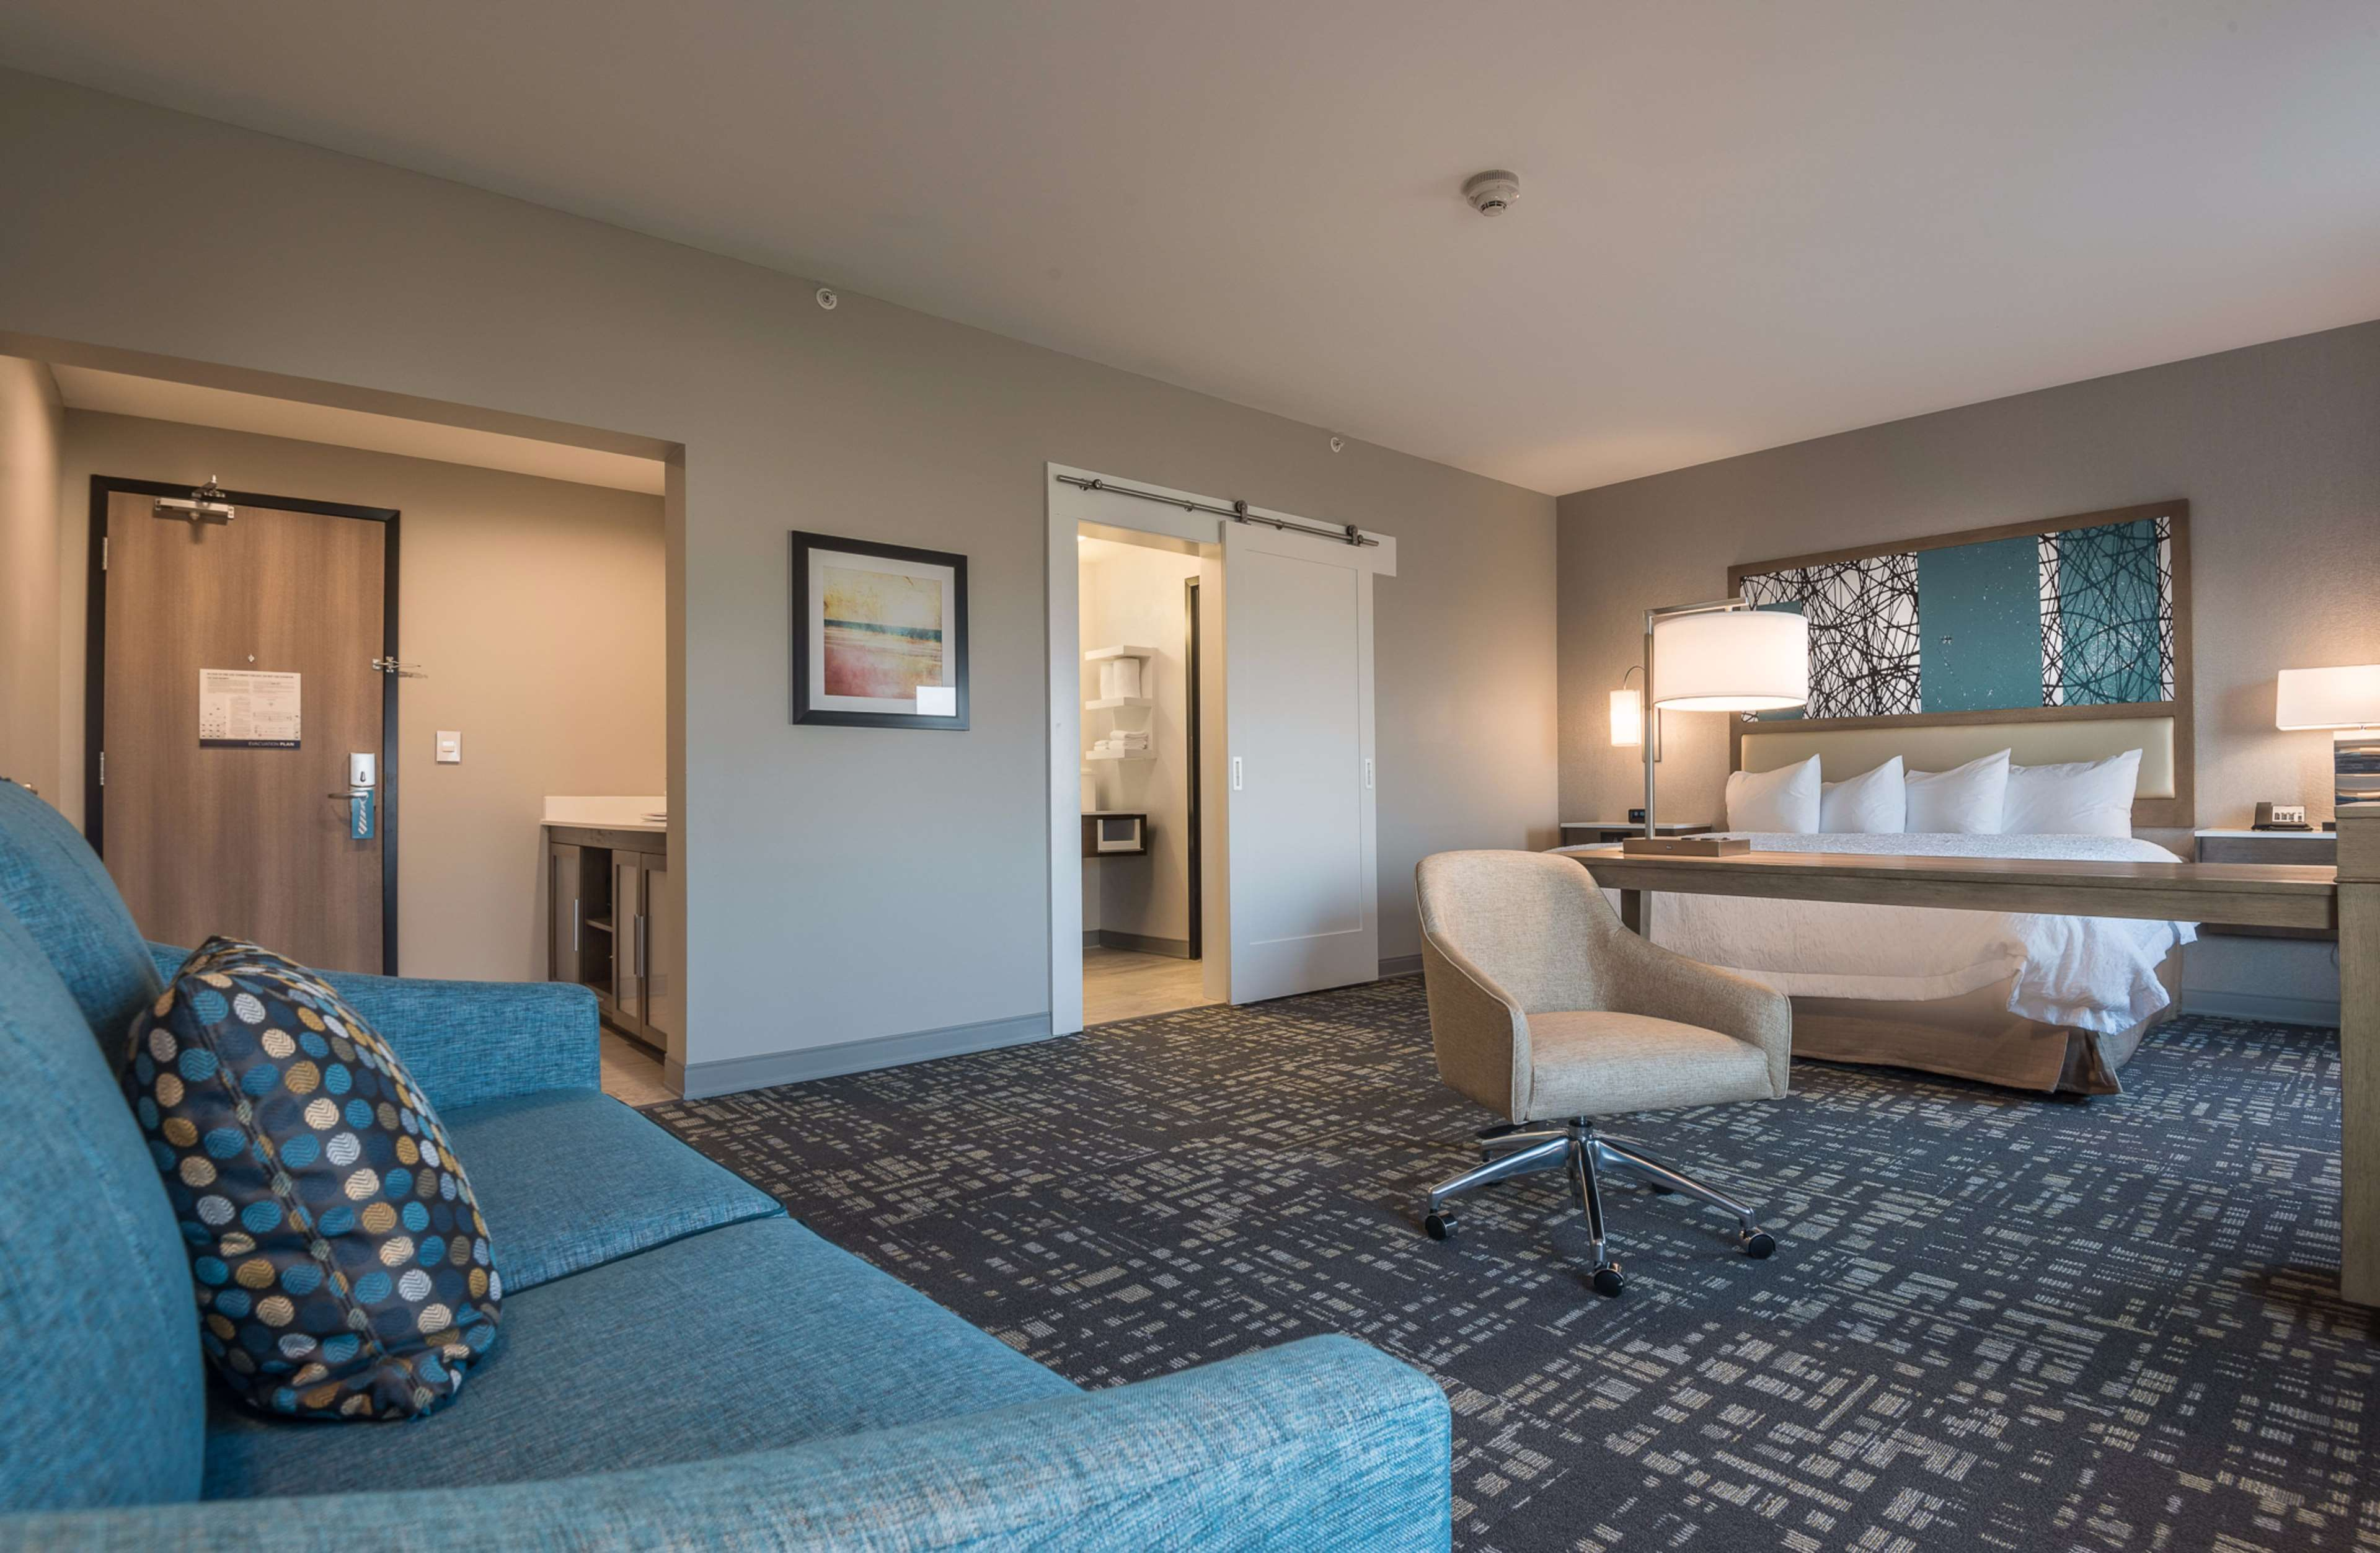 Hampton Inn & Suites Dallas-The Colony, TX image 16